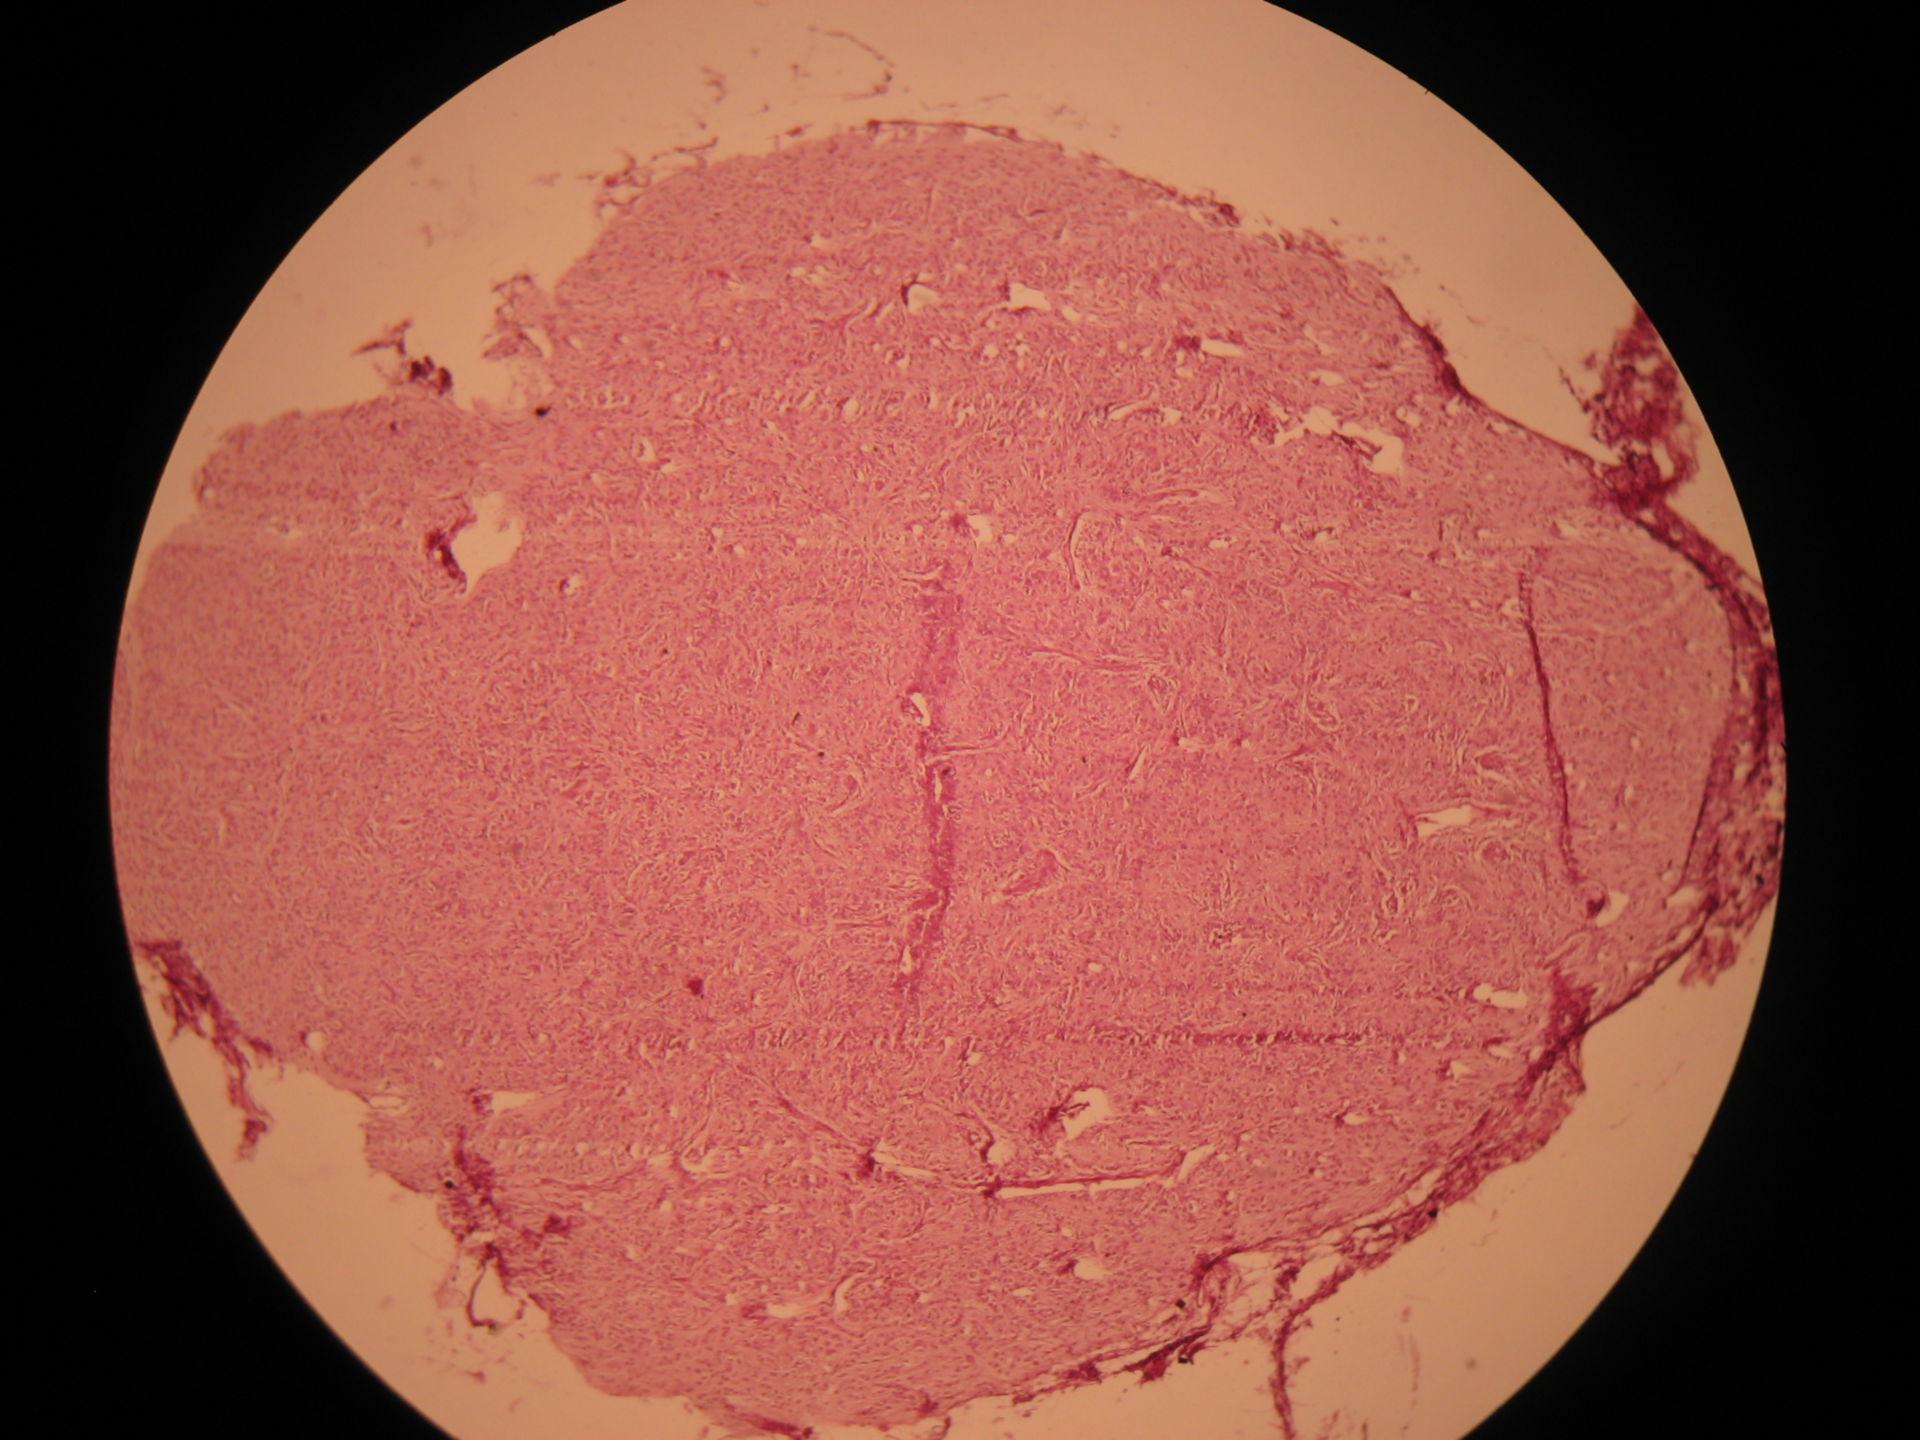 Veterinary medicine: Pineal gland of a calf